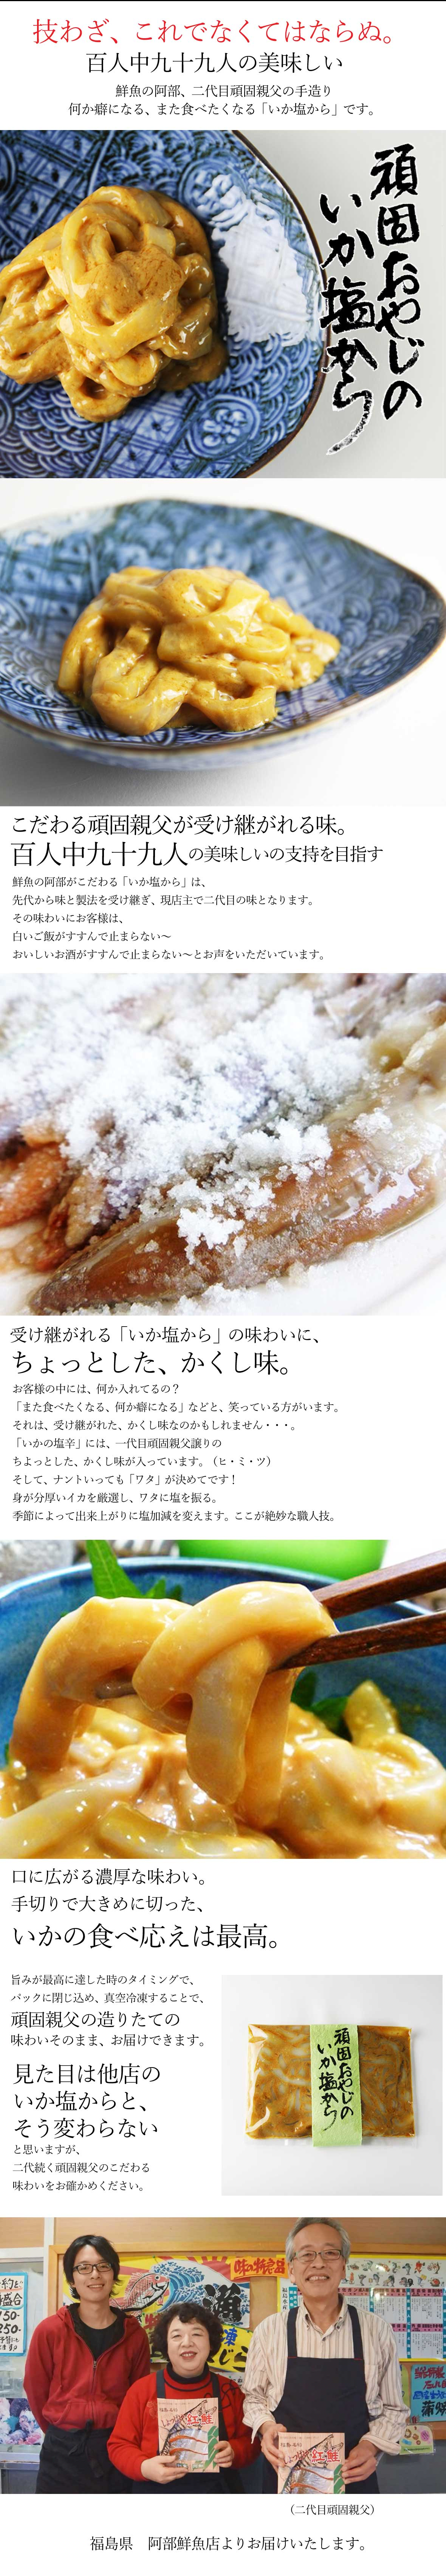 LP_ワイドバナー_阿部鮮魚店